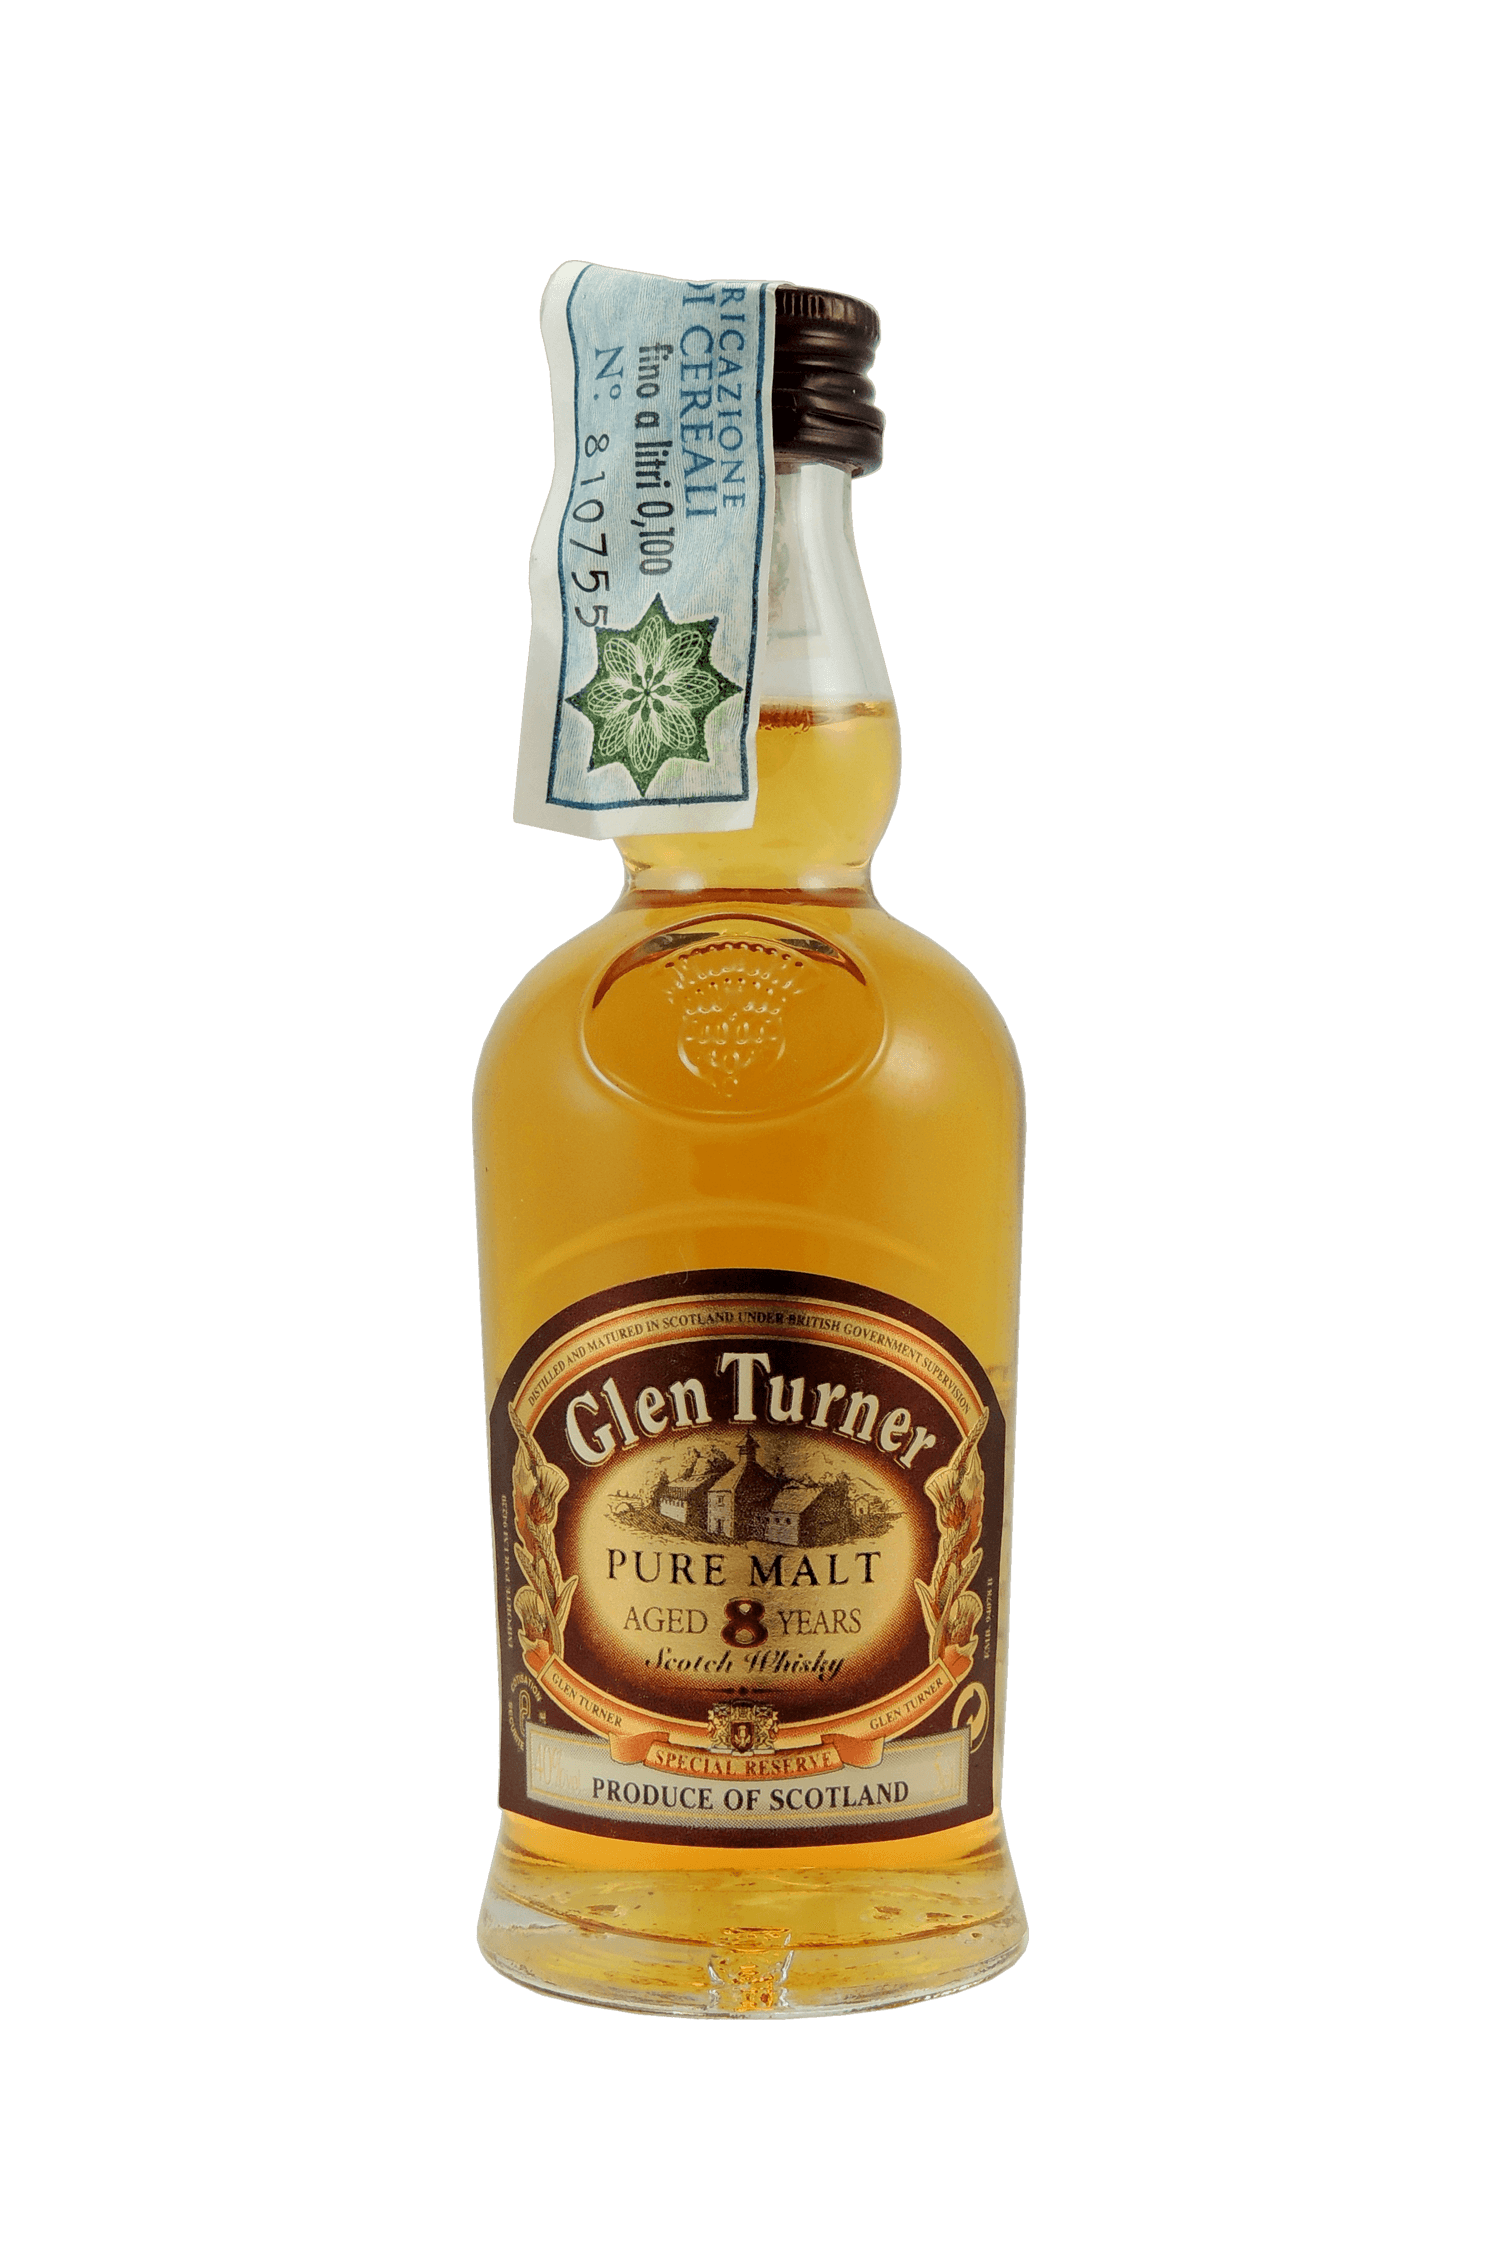 Glen Turner Pure Malt 8 Years